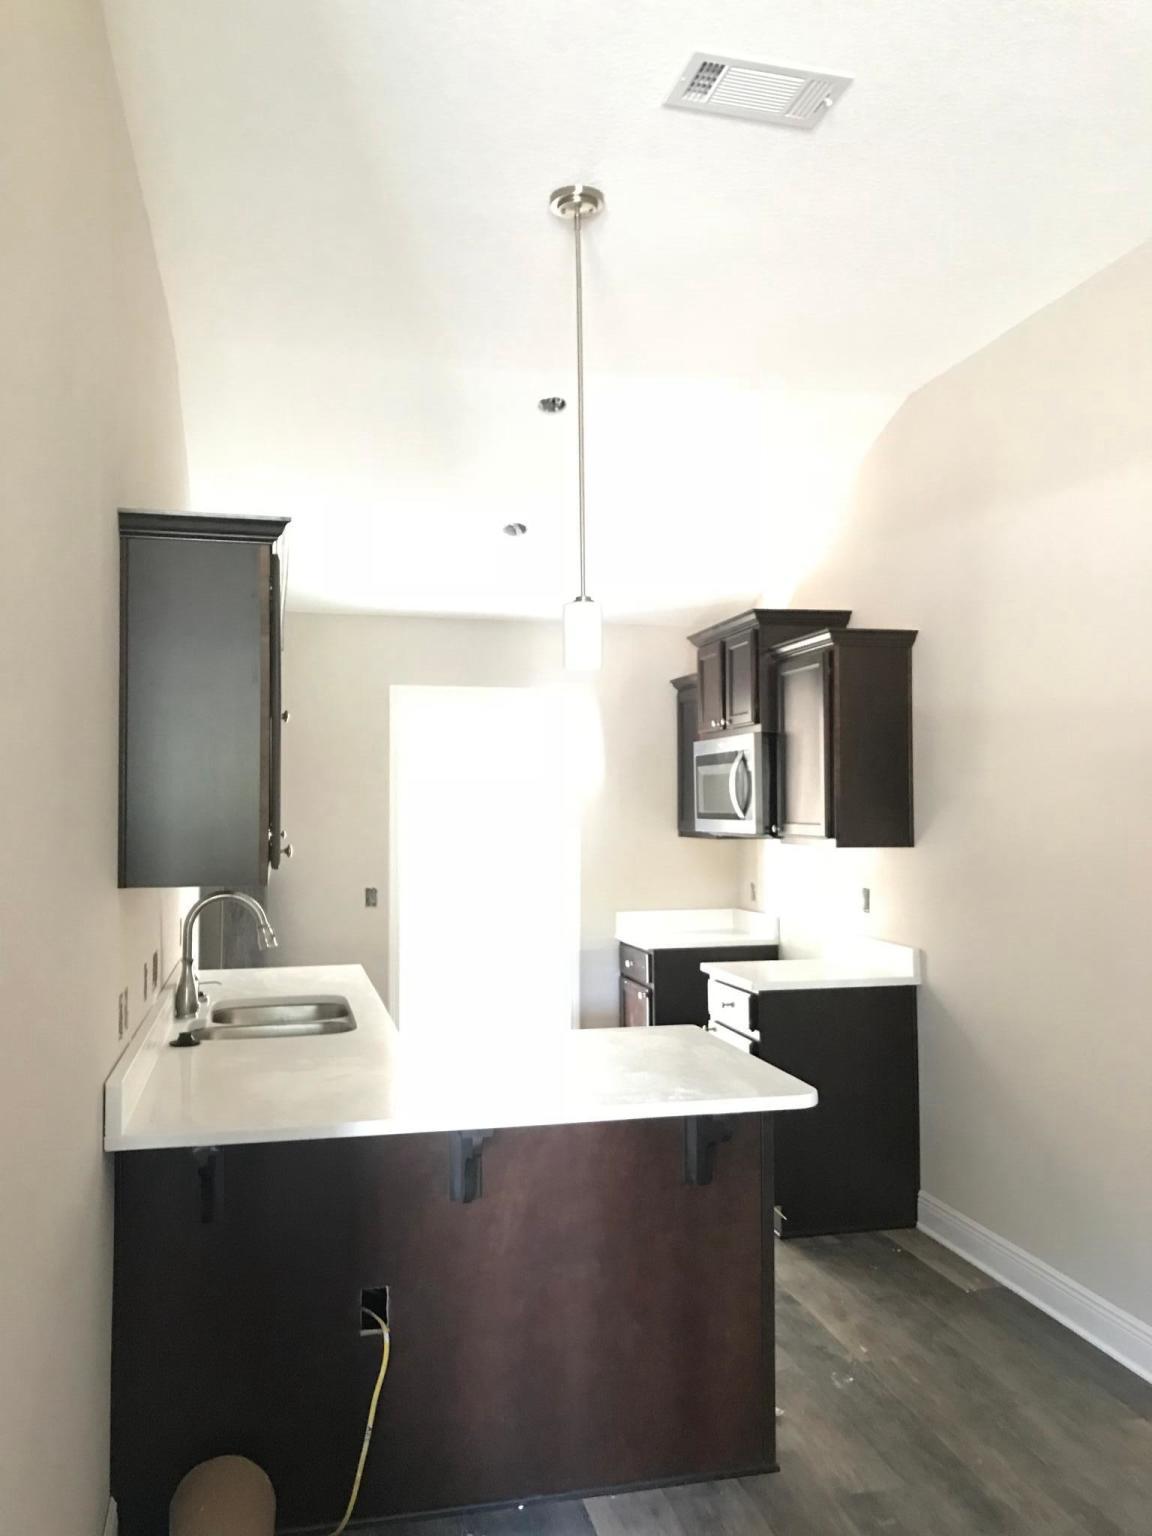 1601 Blackwell Ln For Rent - Pensacola, FL | Trulia